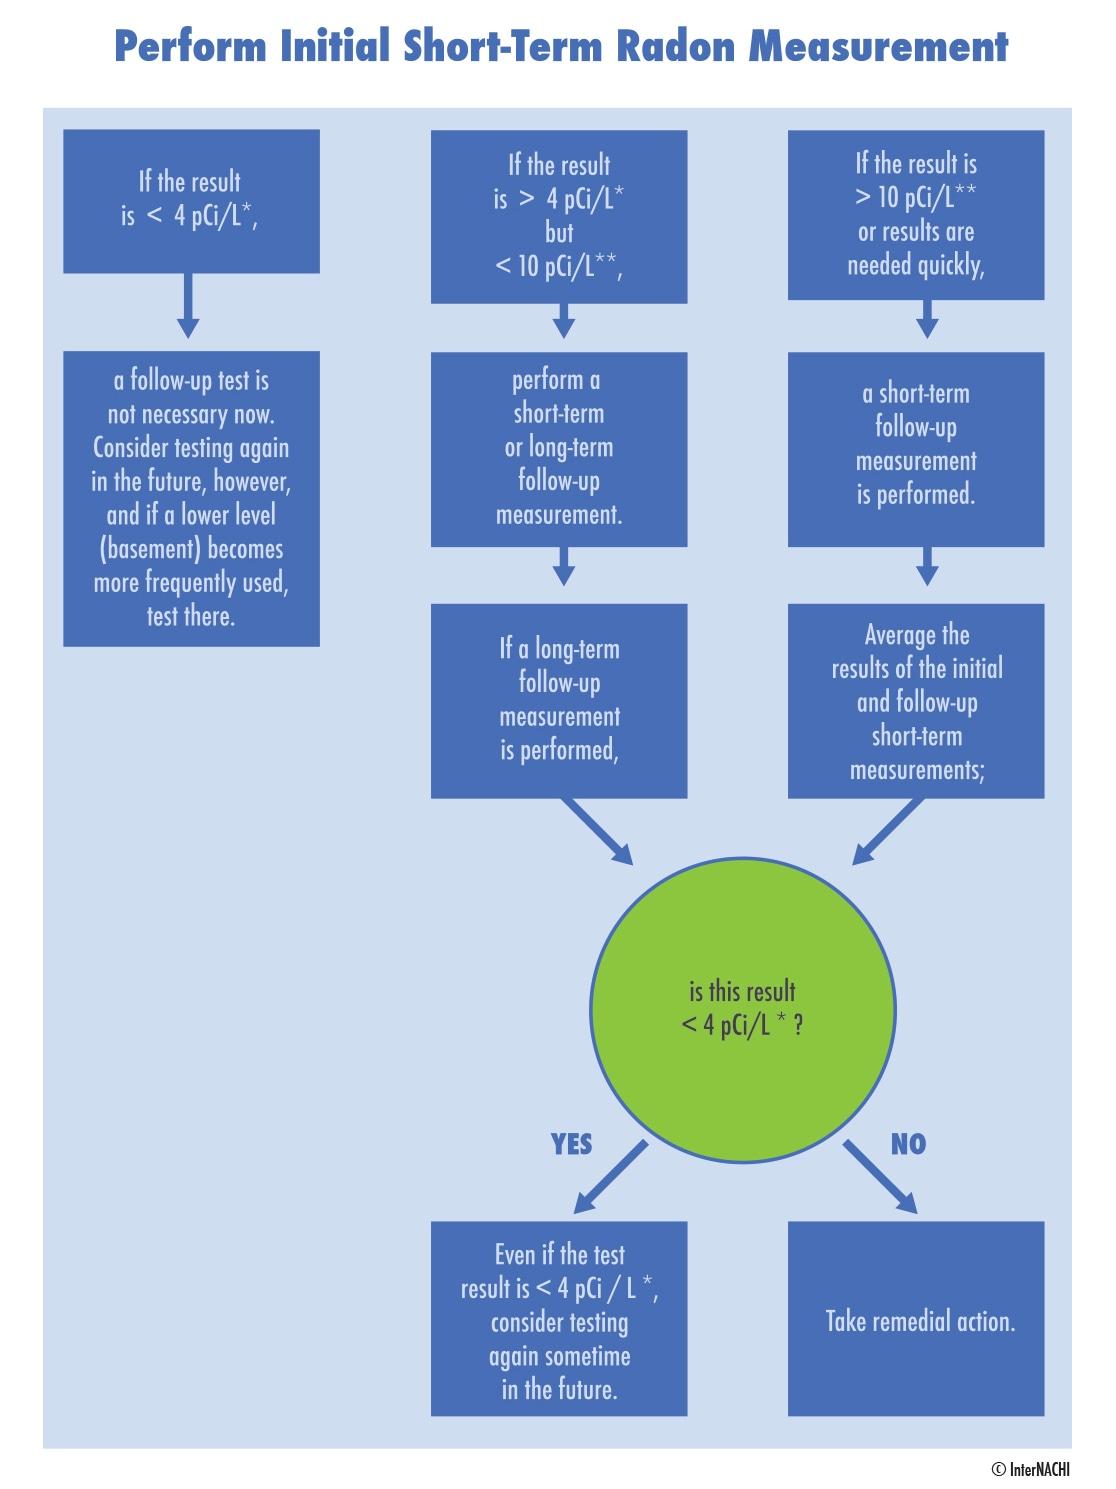 Radon decision chart.